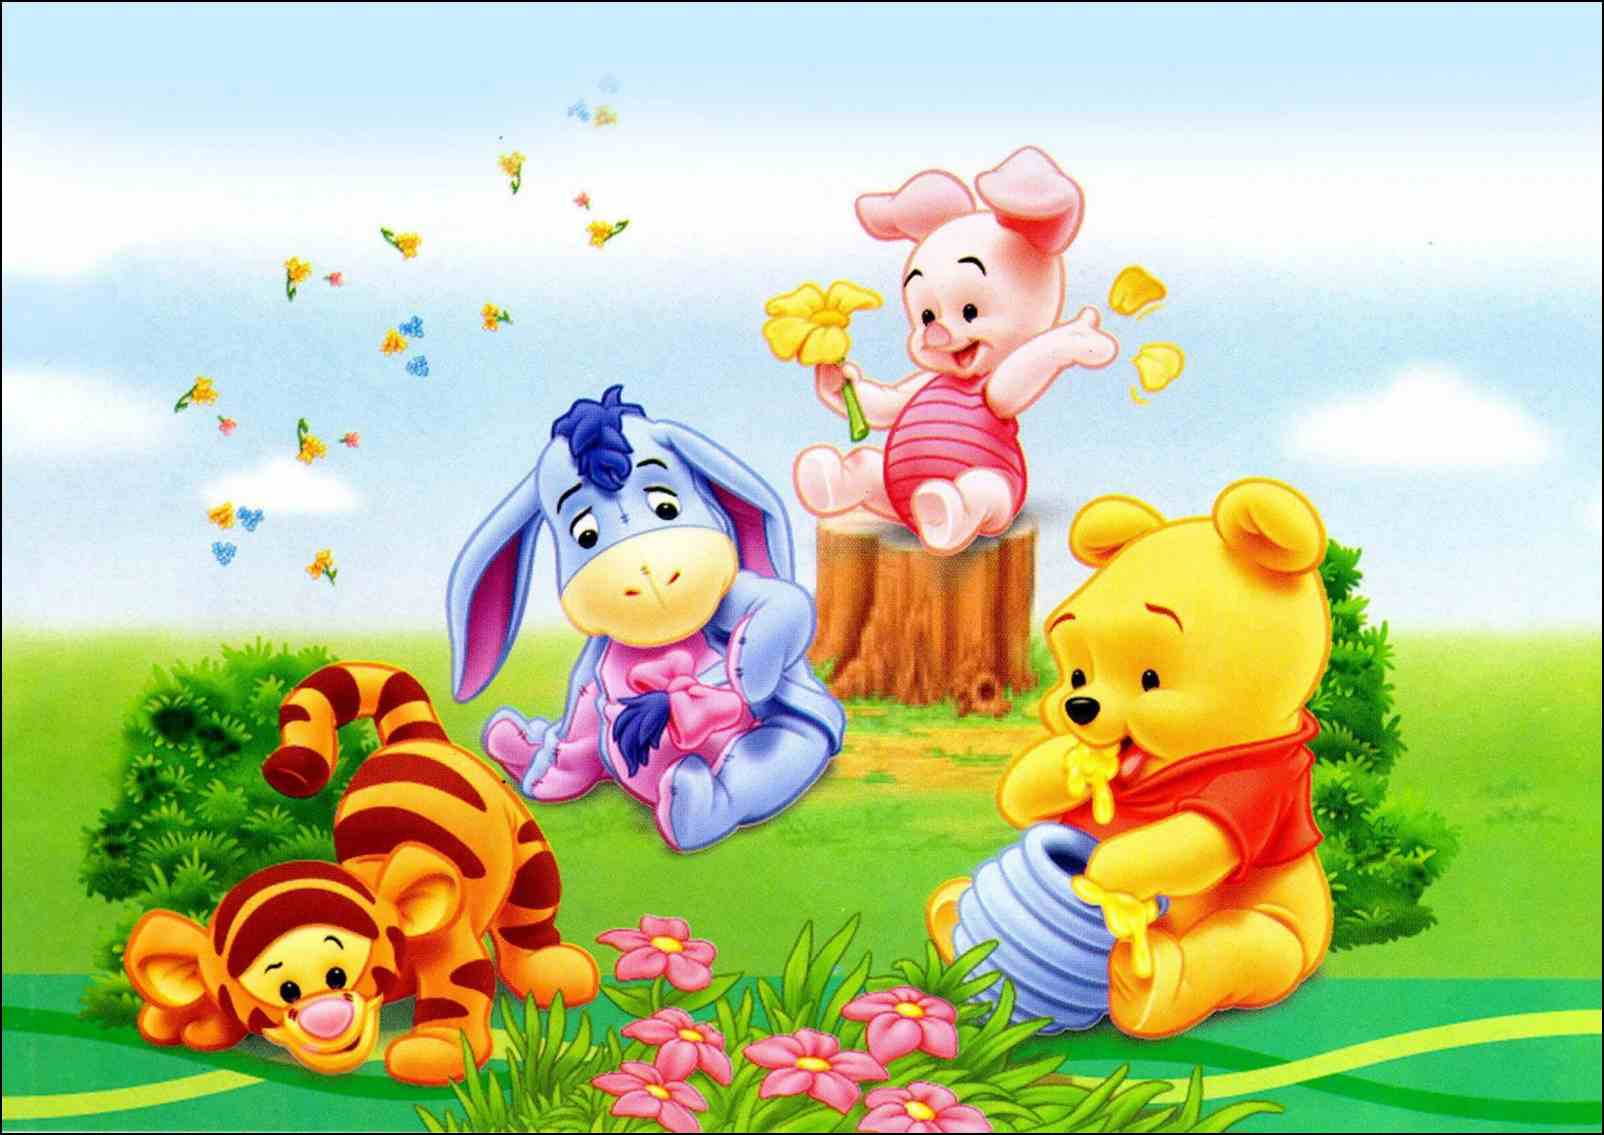 imagenes-de-winnie-pooh-3